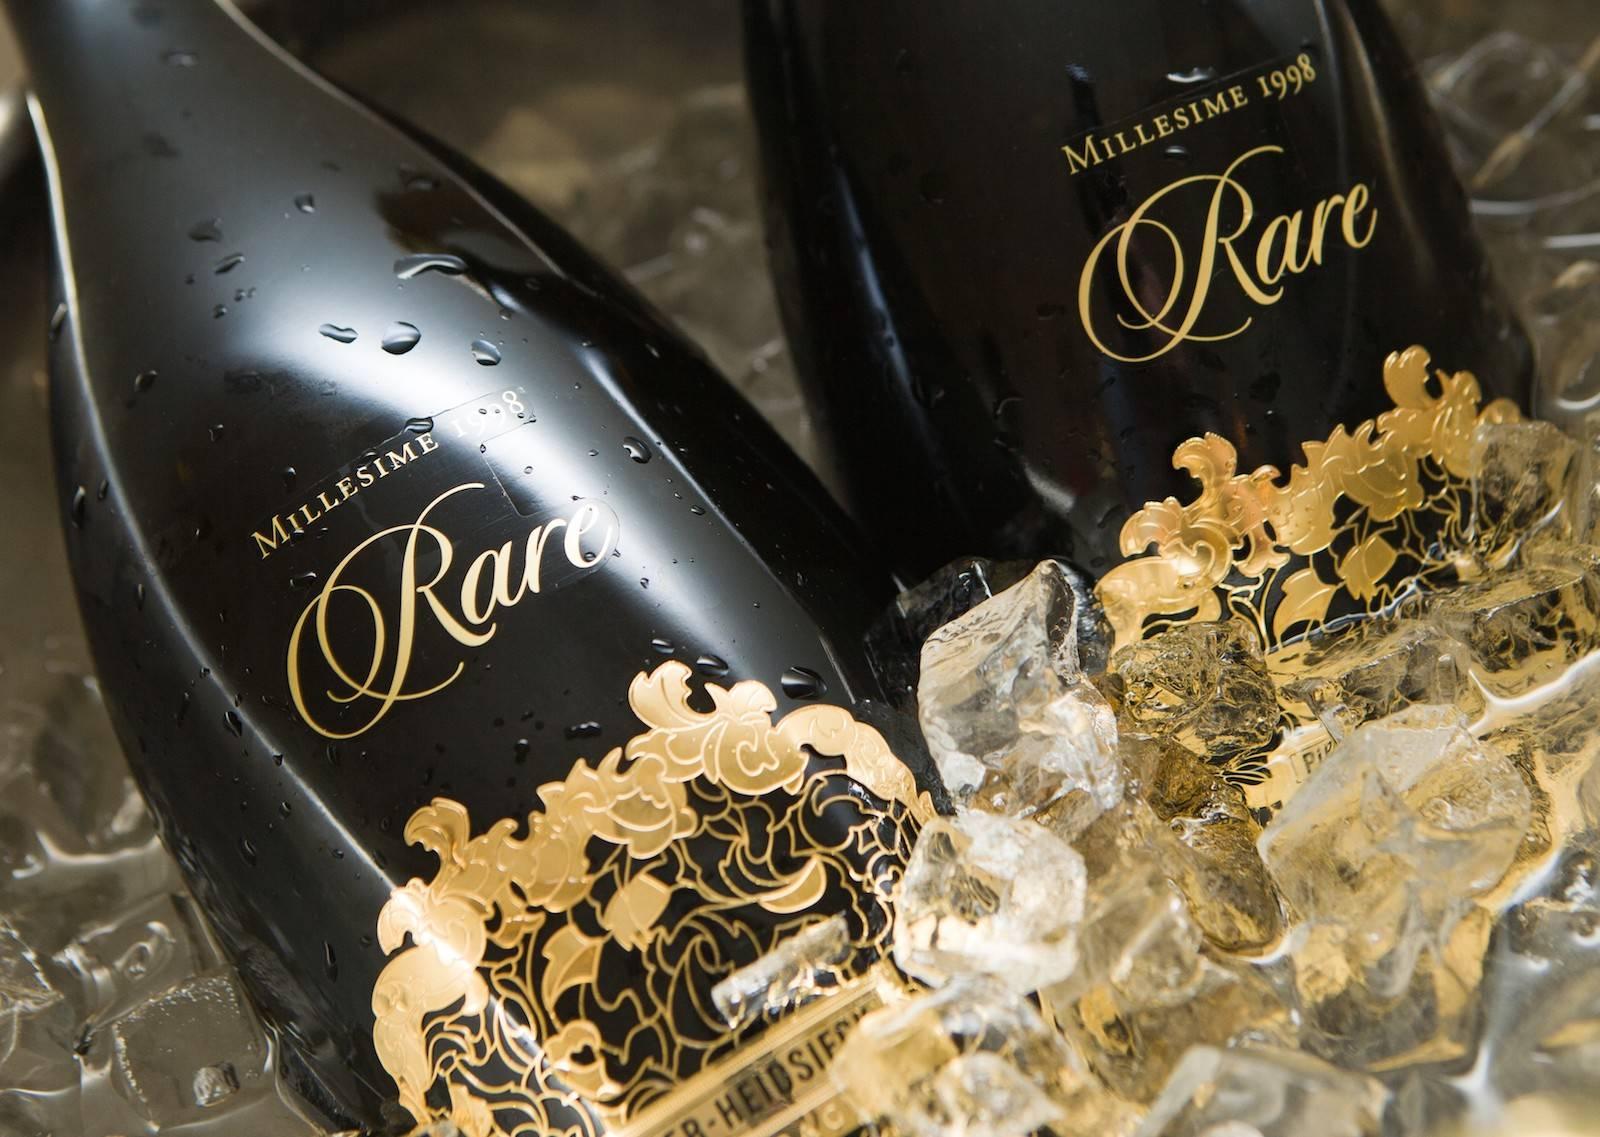 Vamos brindar com um Champagne bem caro?